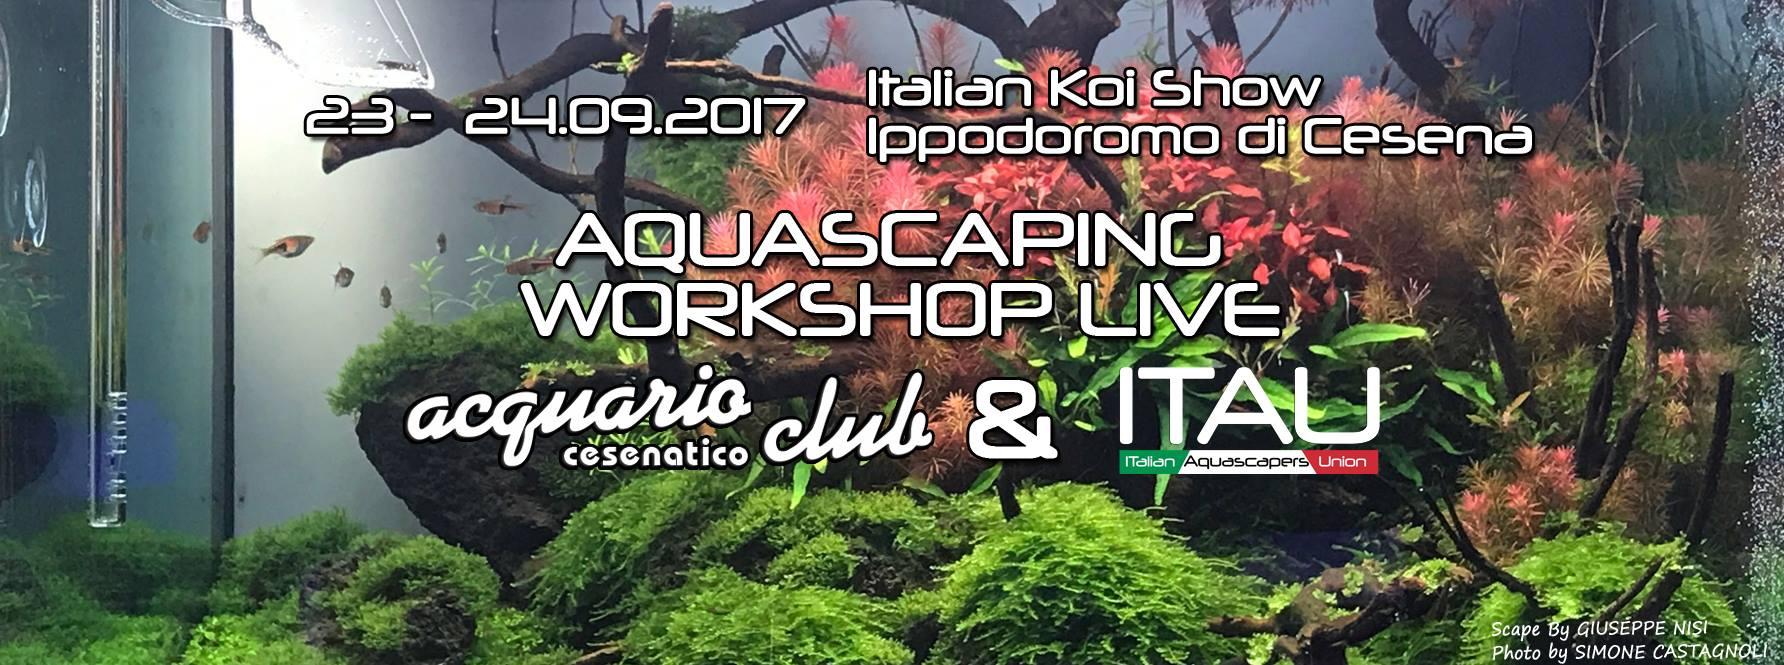 Aquascaping workshop live presso italian koi show 23 e 24 settembre 2017